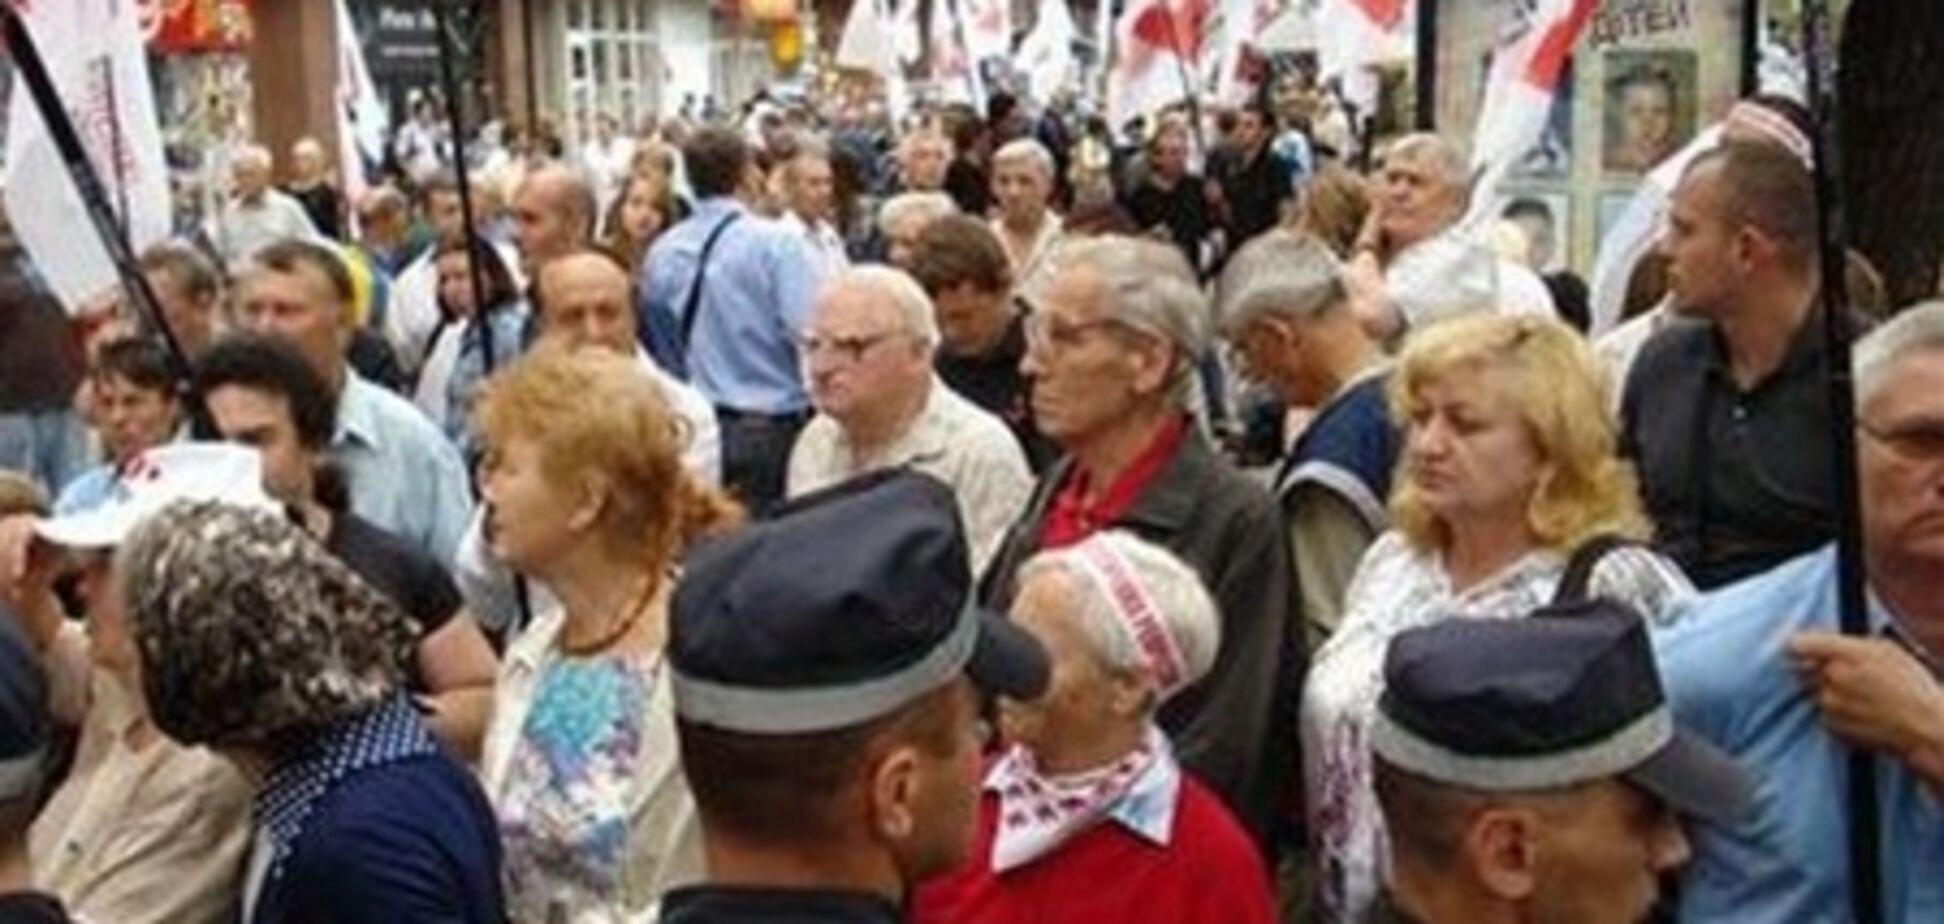 «Батькивщина» тратит 120-150 тысяч гривен на один митинг под Печерским судом